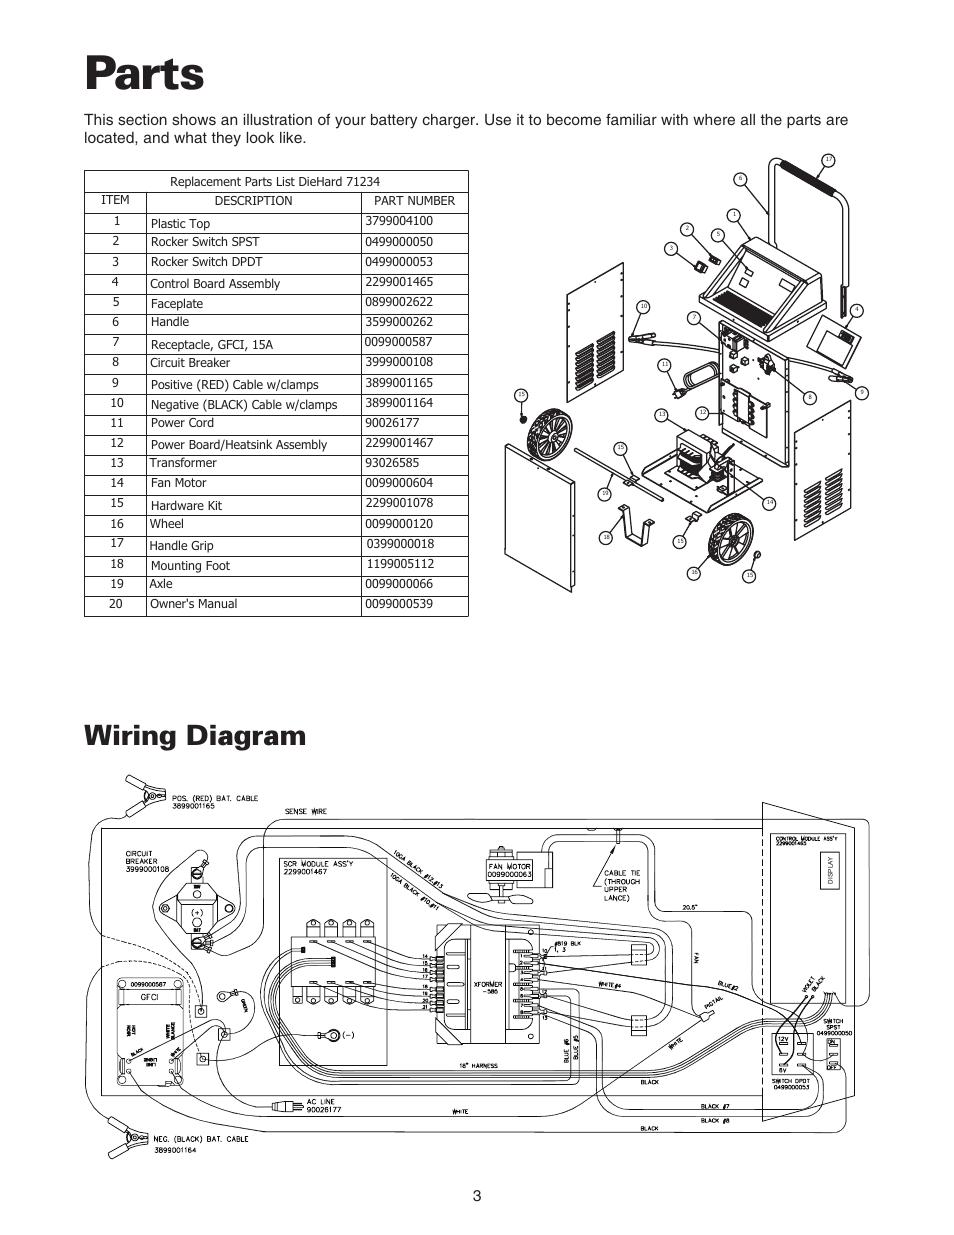 hight resolution of parts wiring diagram sears 200 71234 user manual page 4 15 rh manualsdir com